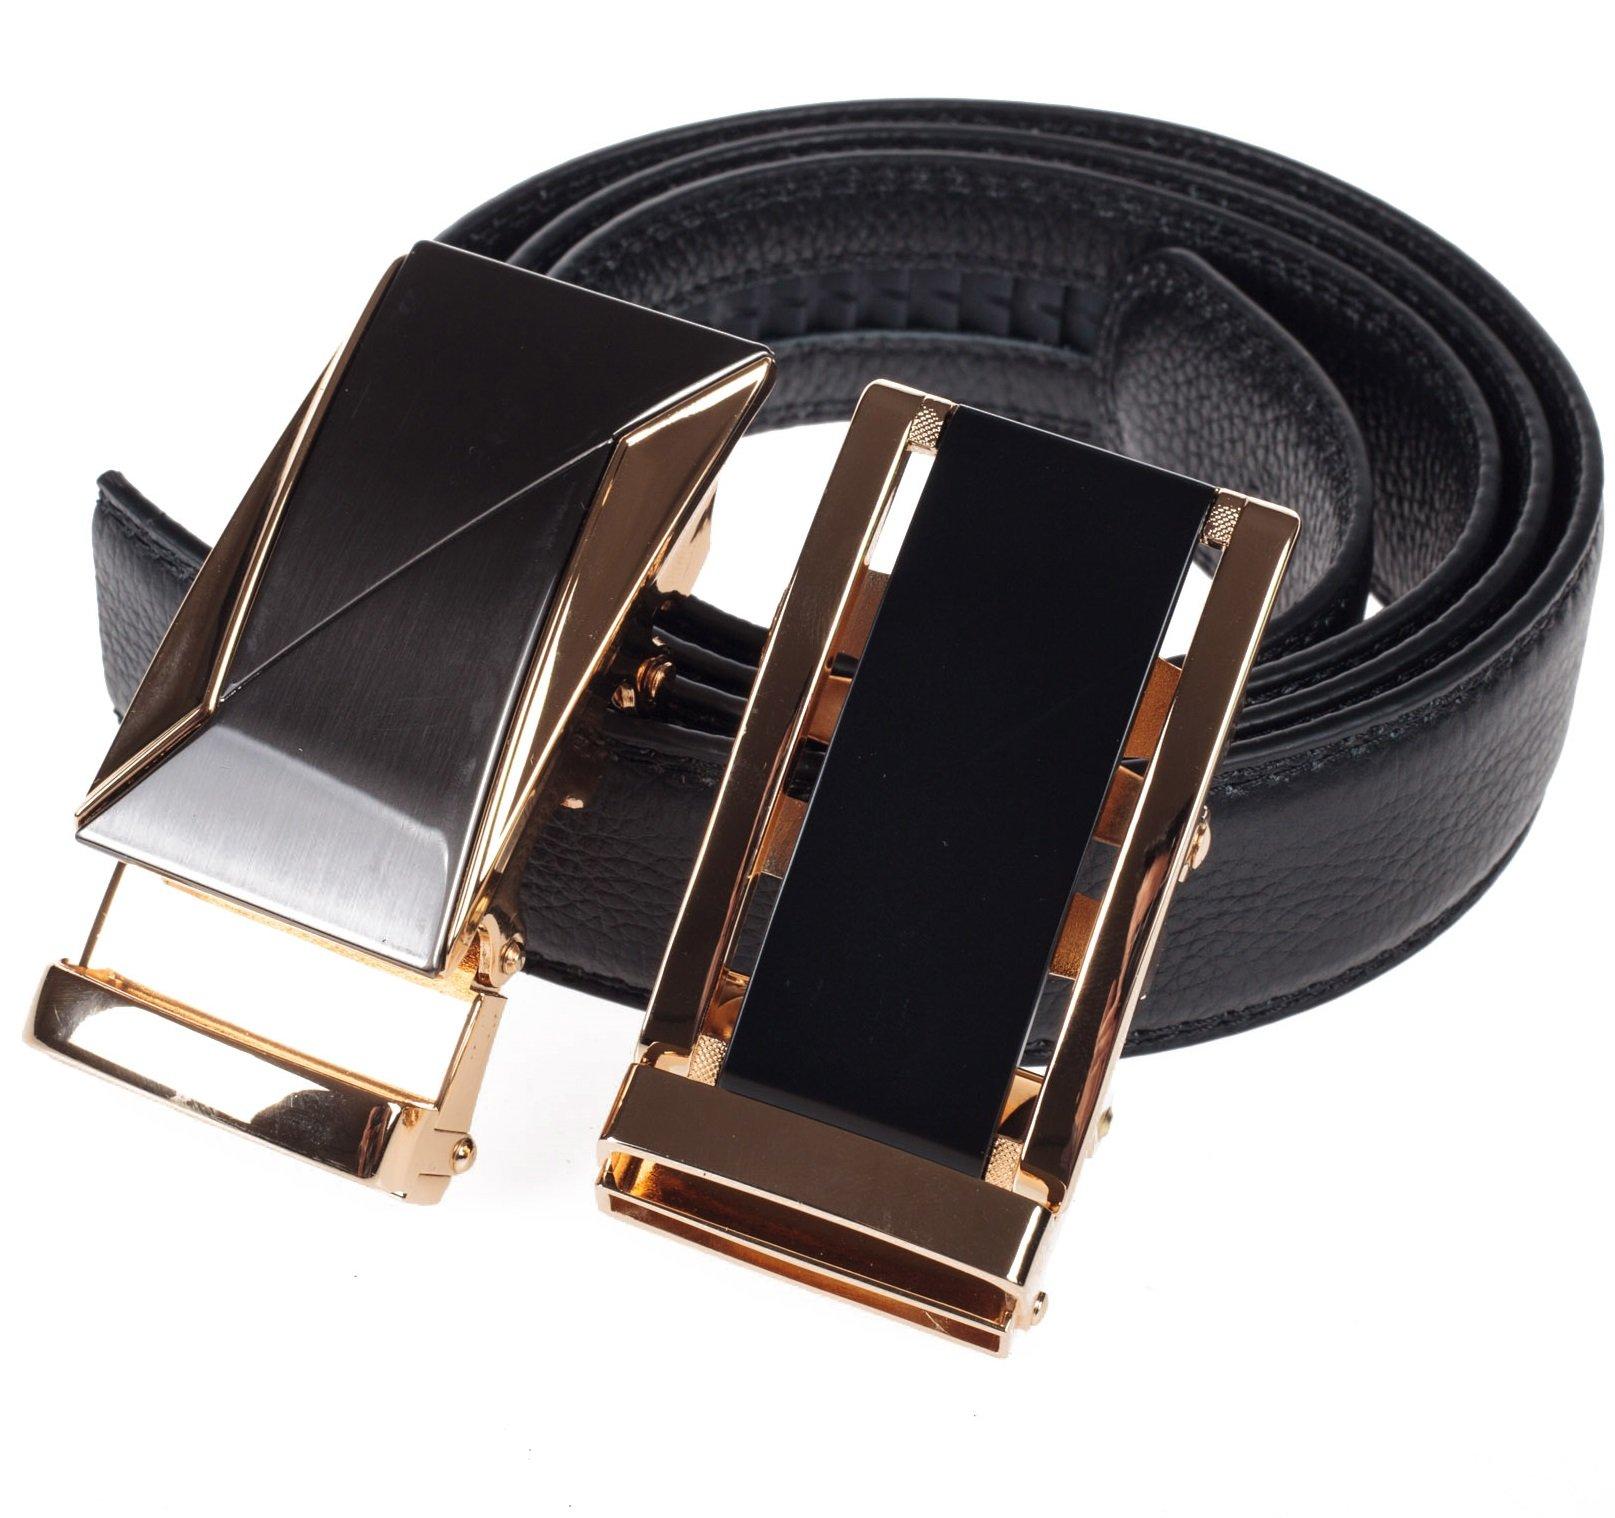 Men's Belt Slide Ratchet Belts for Men - Genuine Leather with 2 Automatic Buckles - Gift Box